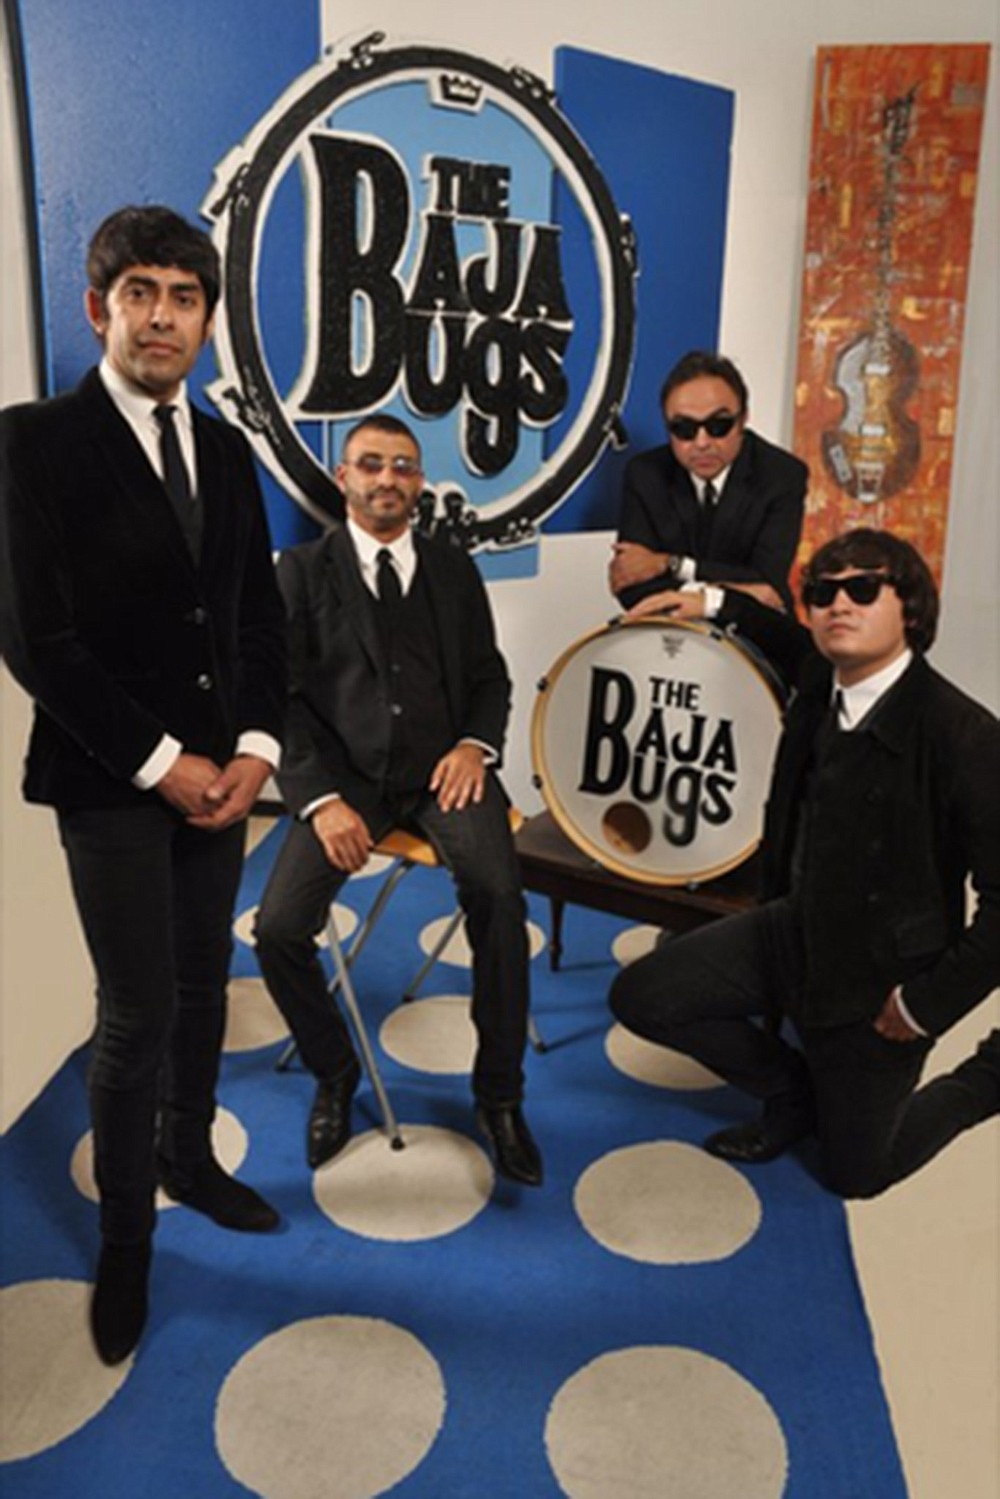 The Baja Bugs at the Beatles Fair